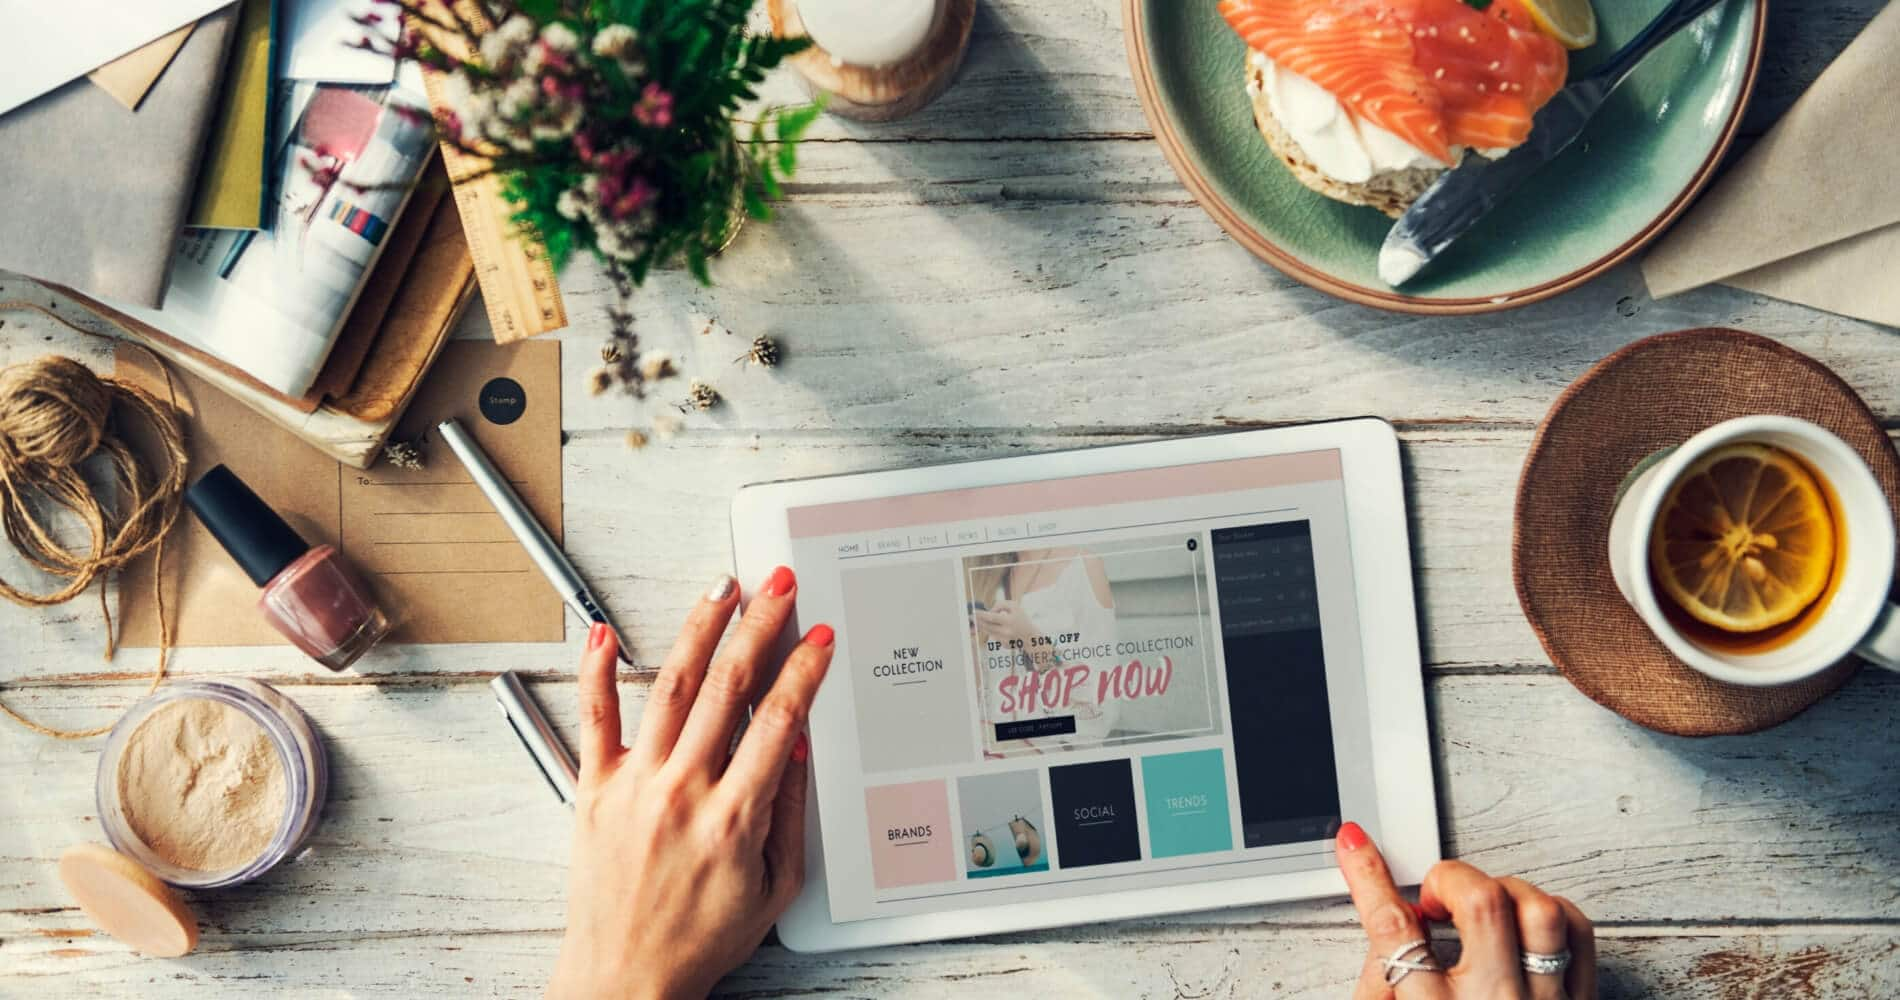 Online Shopping - The Hibbs Lupus Trust